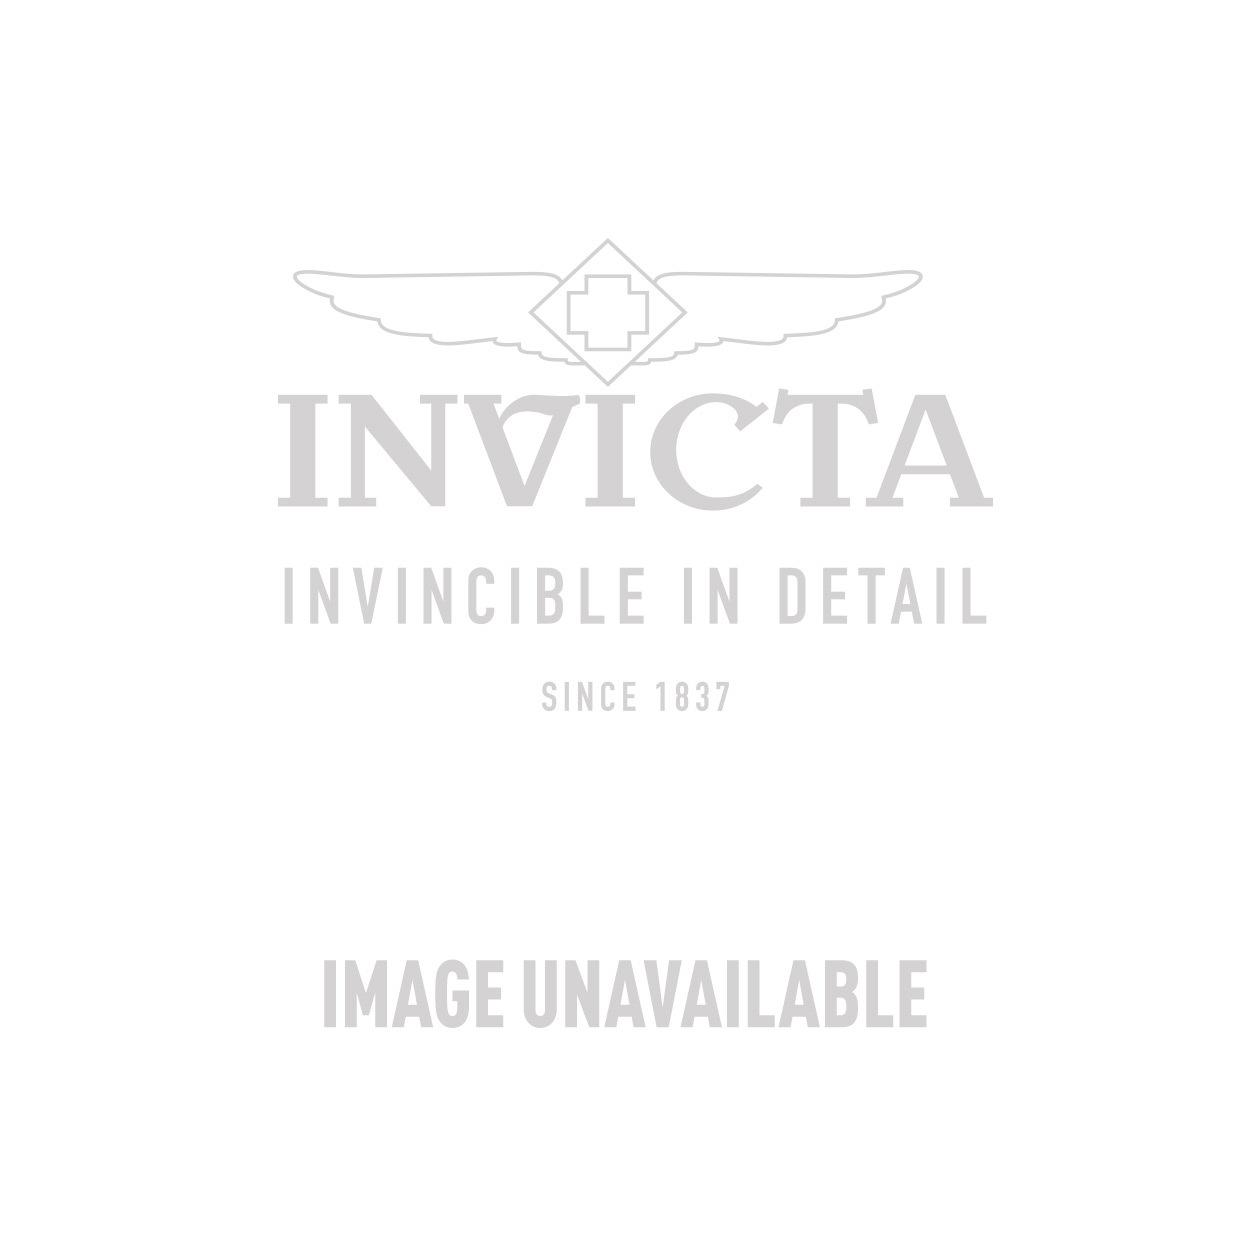 Invicta Sea Base Swiss Made Quartz Watch - Gold, Black case with Black tone Polyurethane band - Model 14254